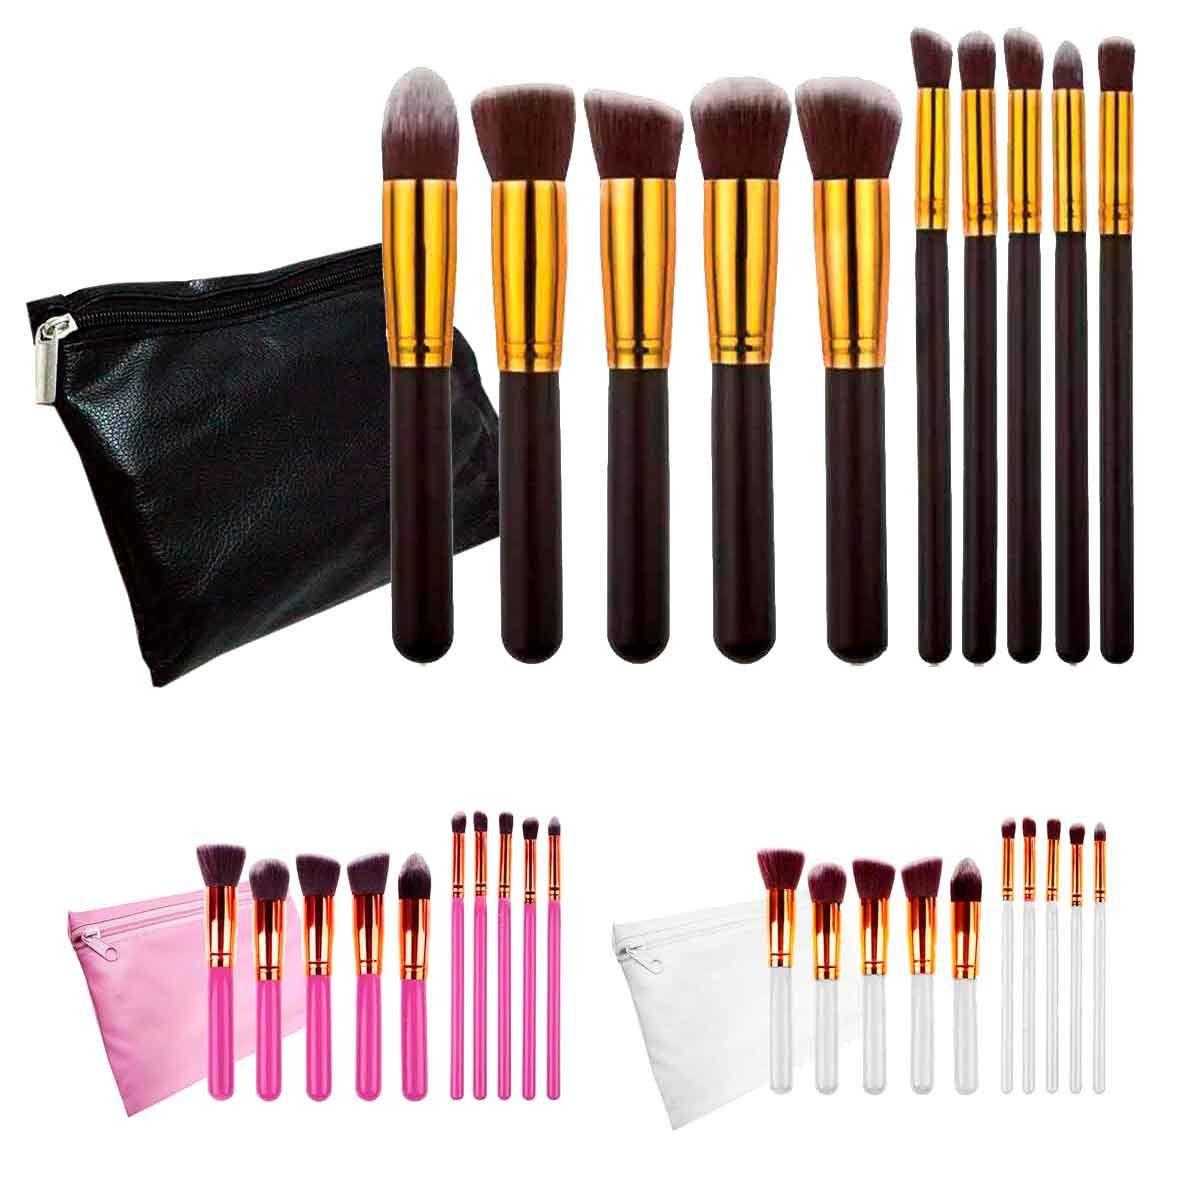 Kit 10 Pincéis Maquiagem Kabuki Estojo Profissional Blush Pó